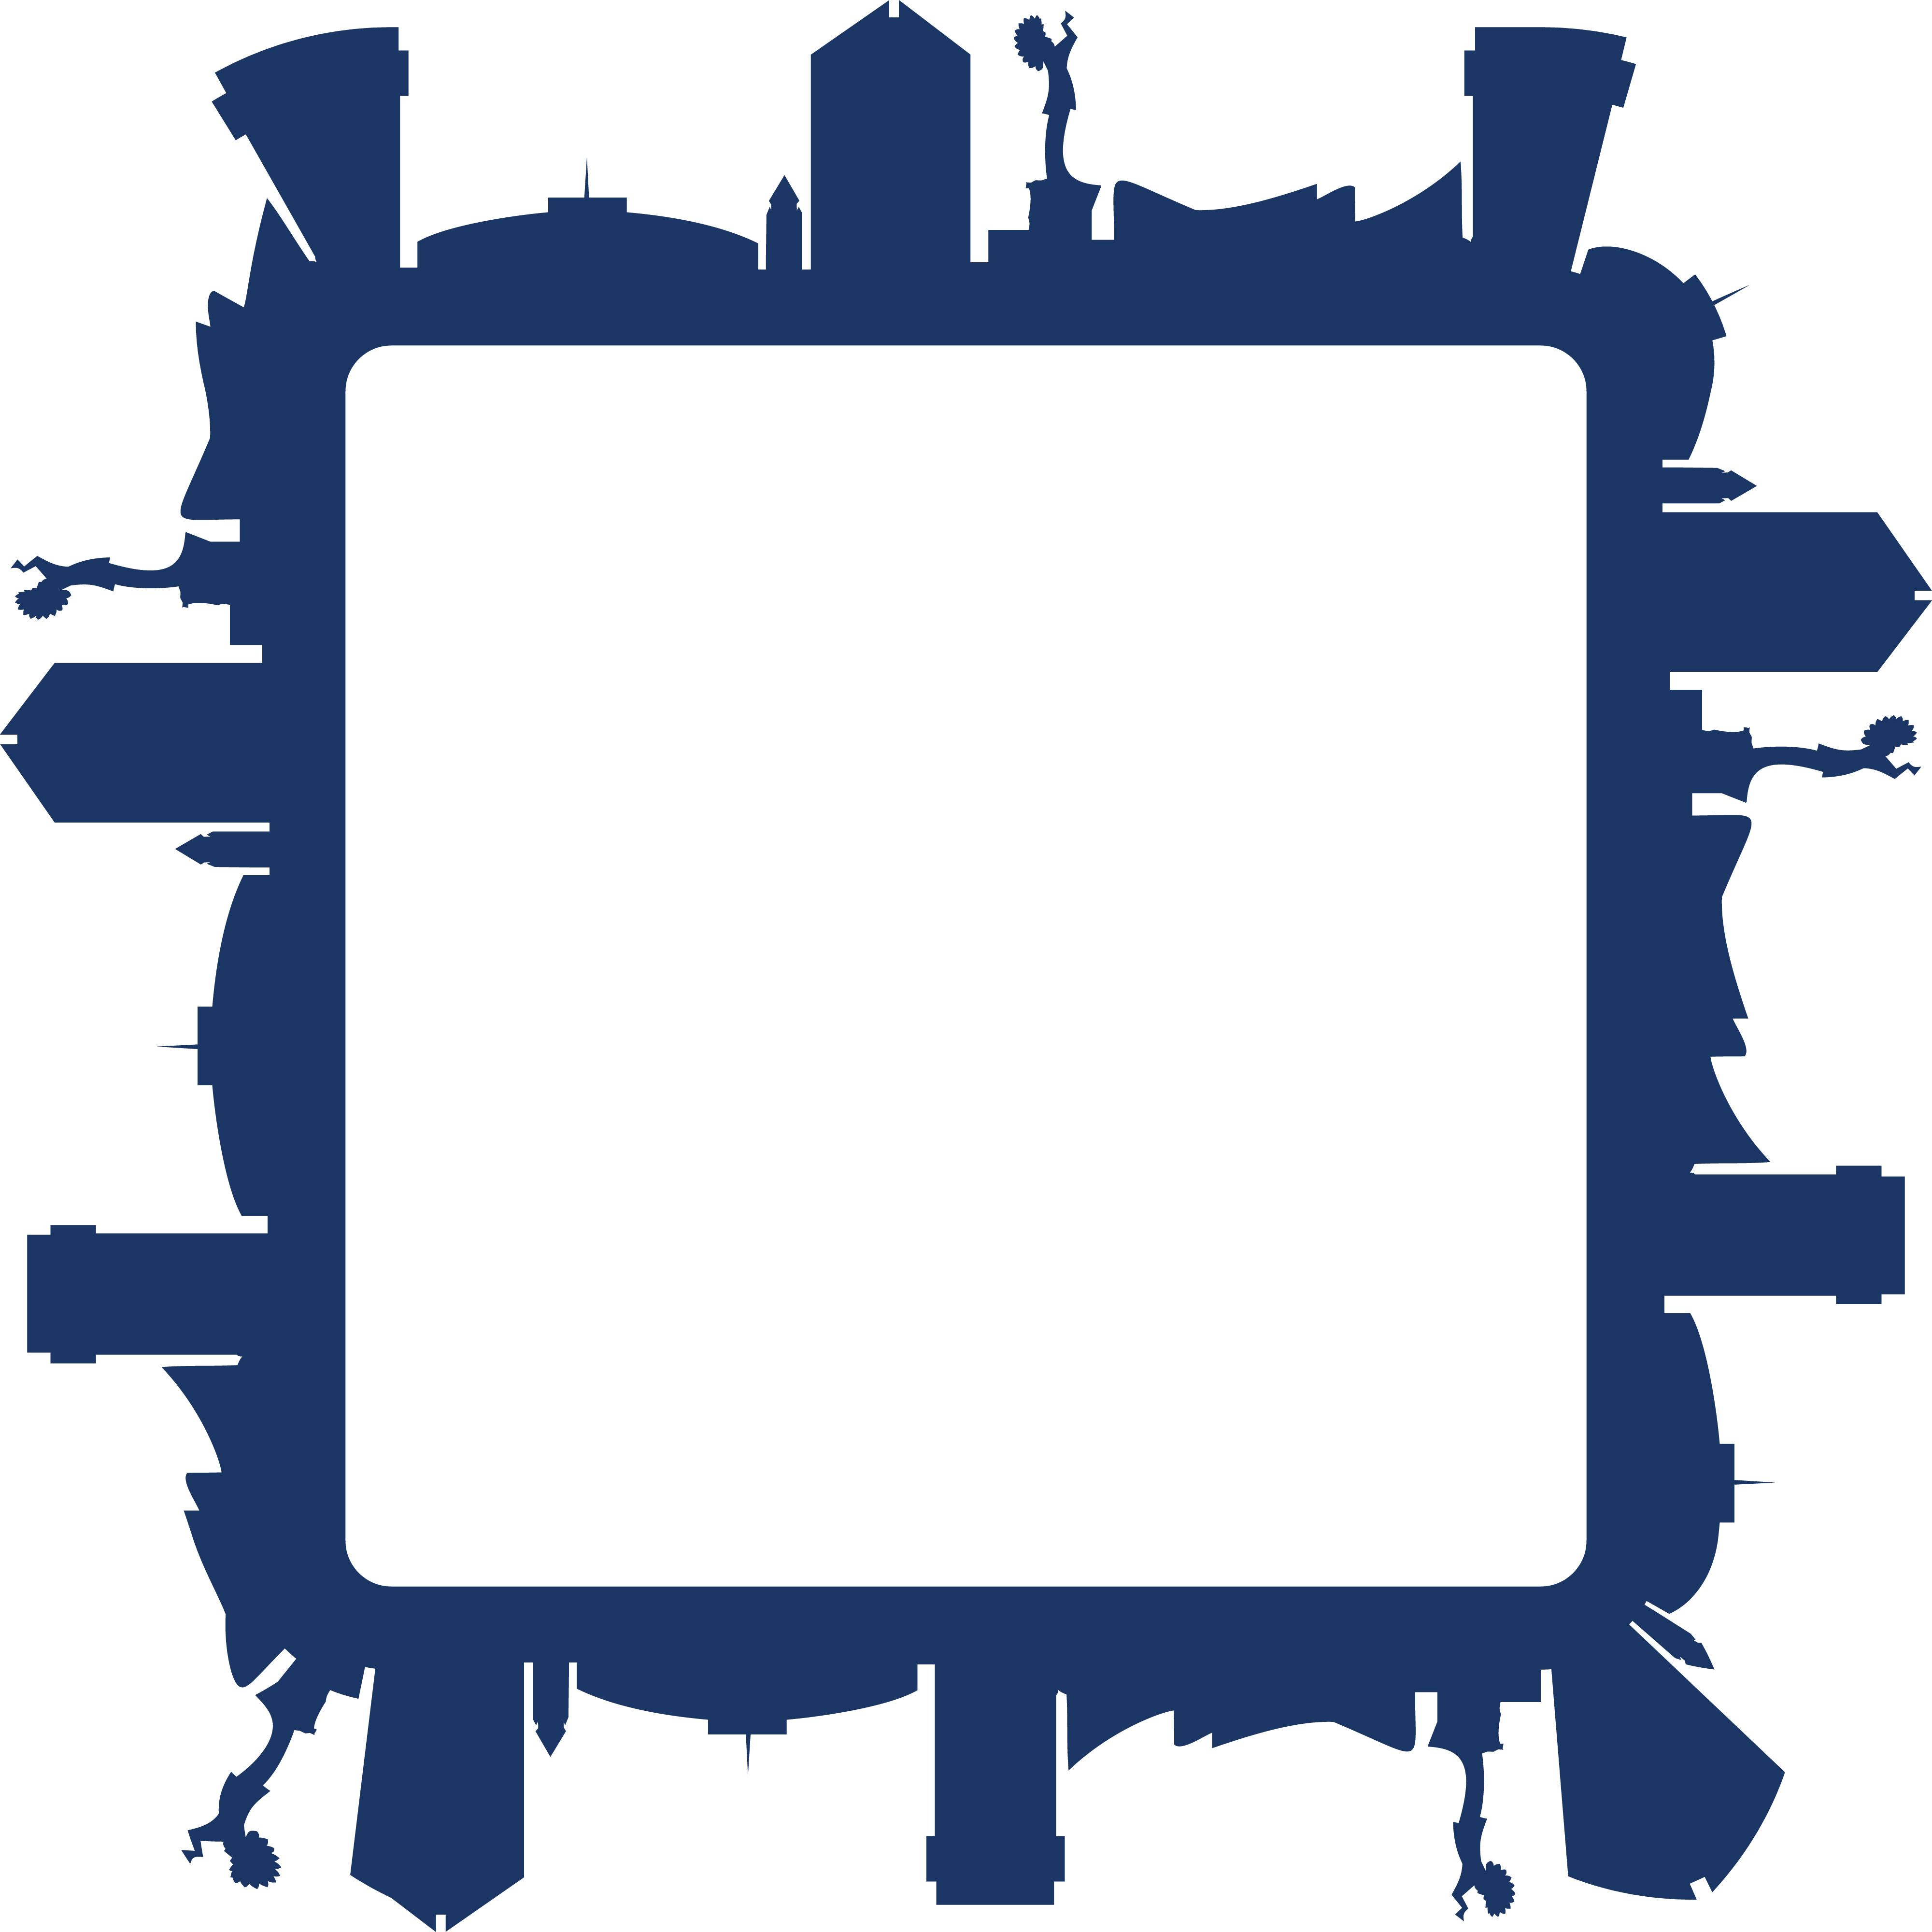 4000x4000 Free Clipart Of A Square Frame Of The Wichita Kansas Skyline